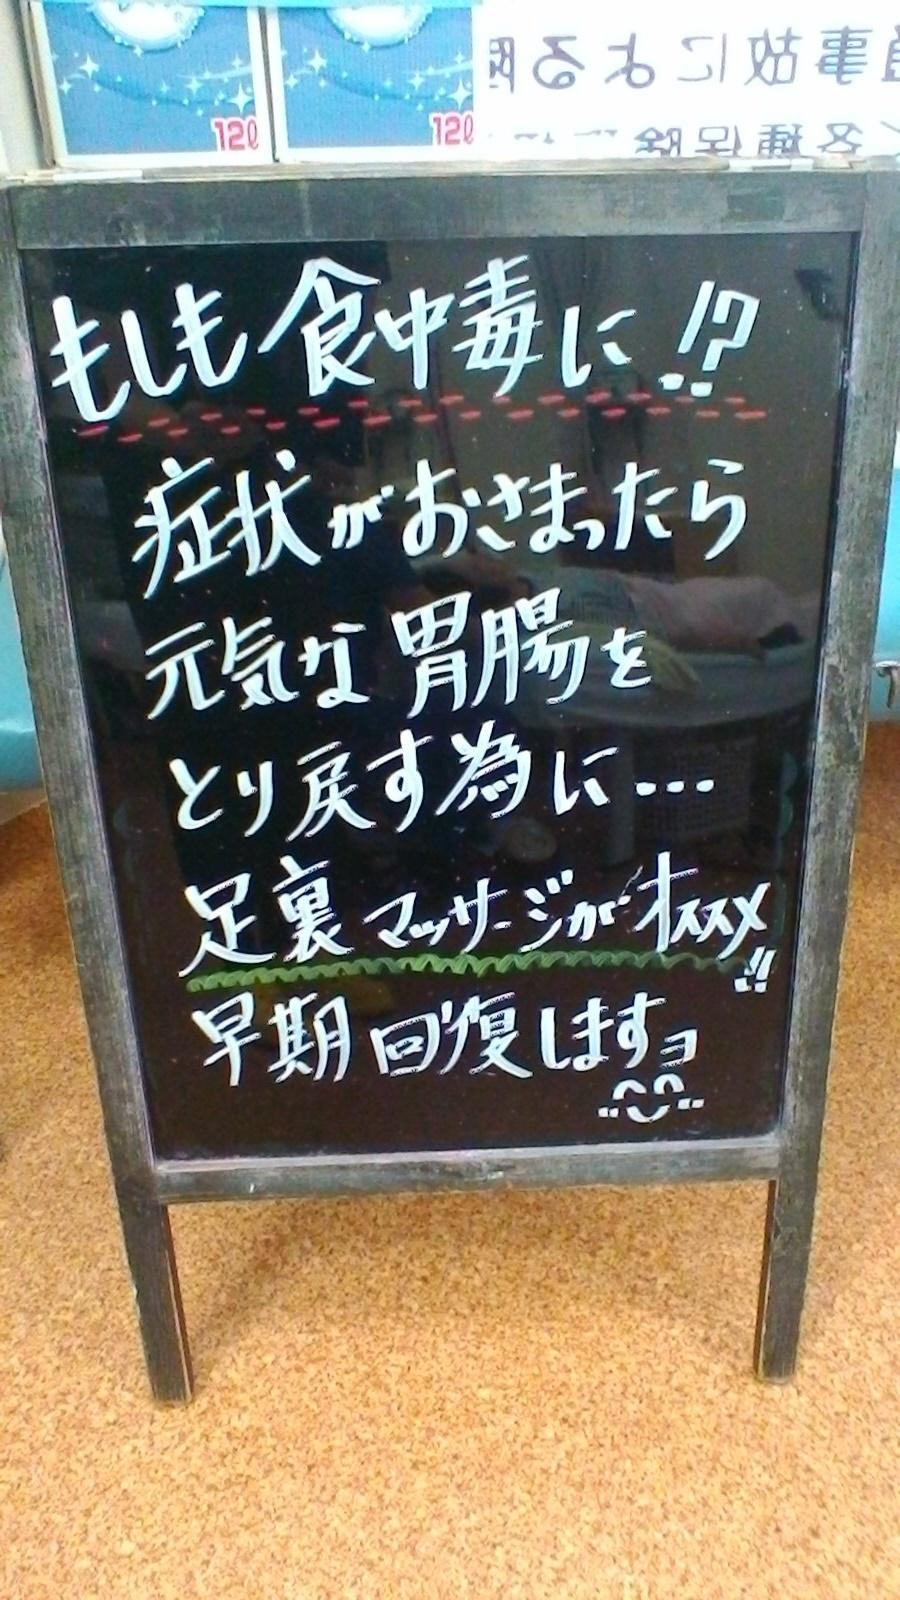 shokuchuudoku2.jpg